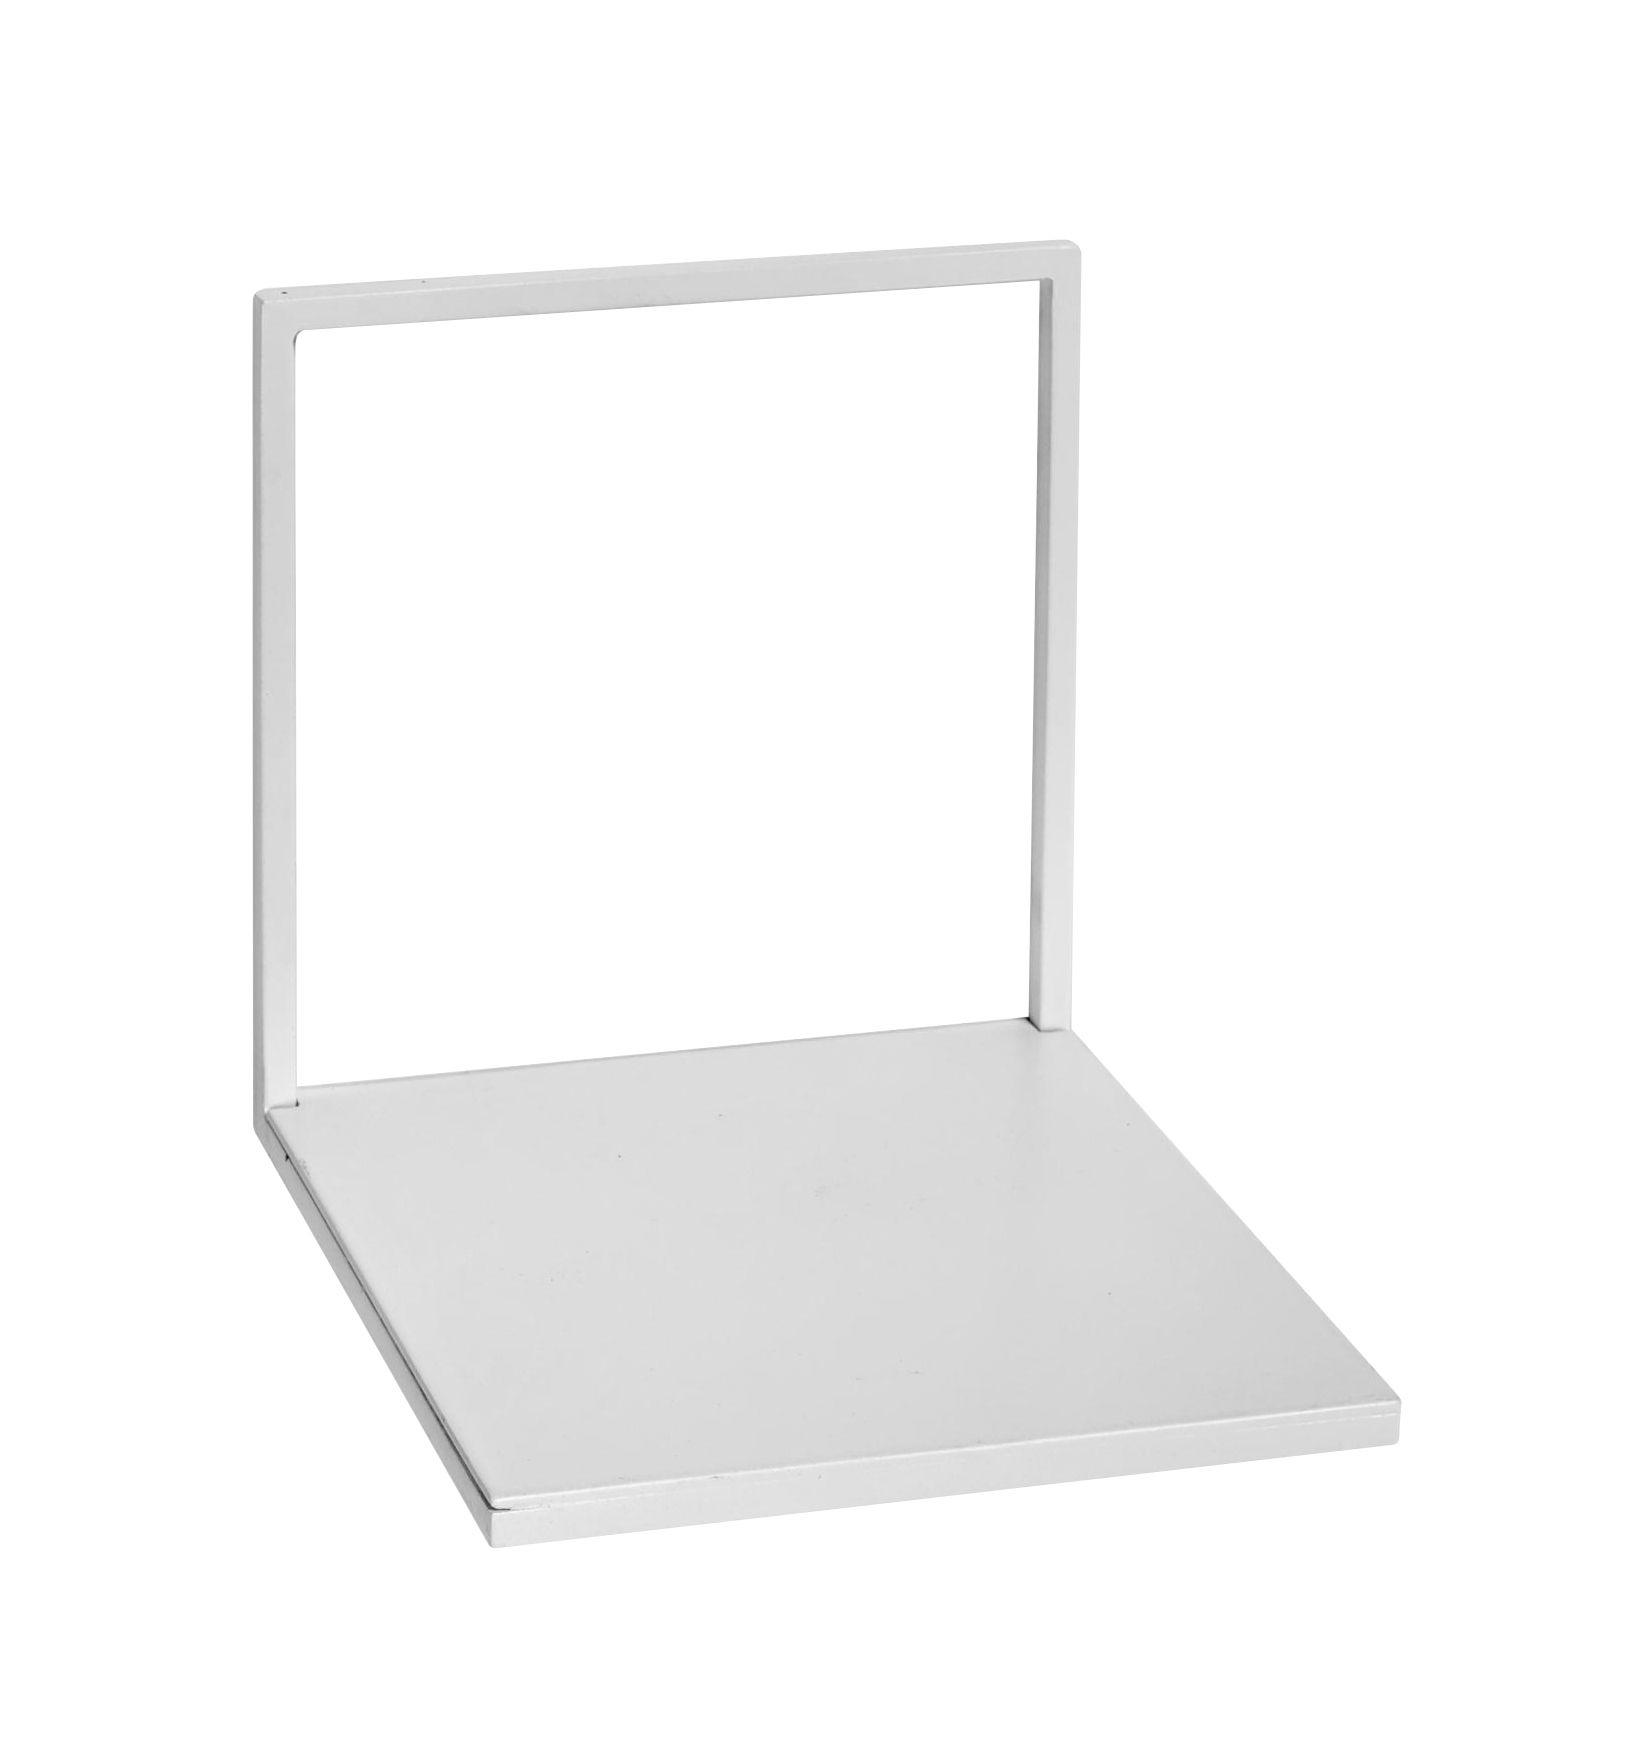 etag re small l 15 cm m tal blanc serax made in design. Black Bedroom Furniture Sets. Home Design Ideas